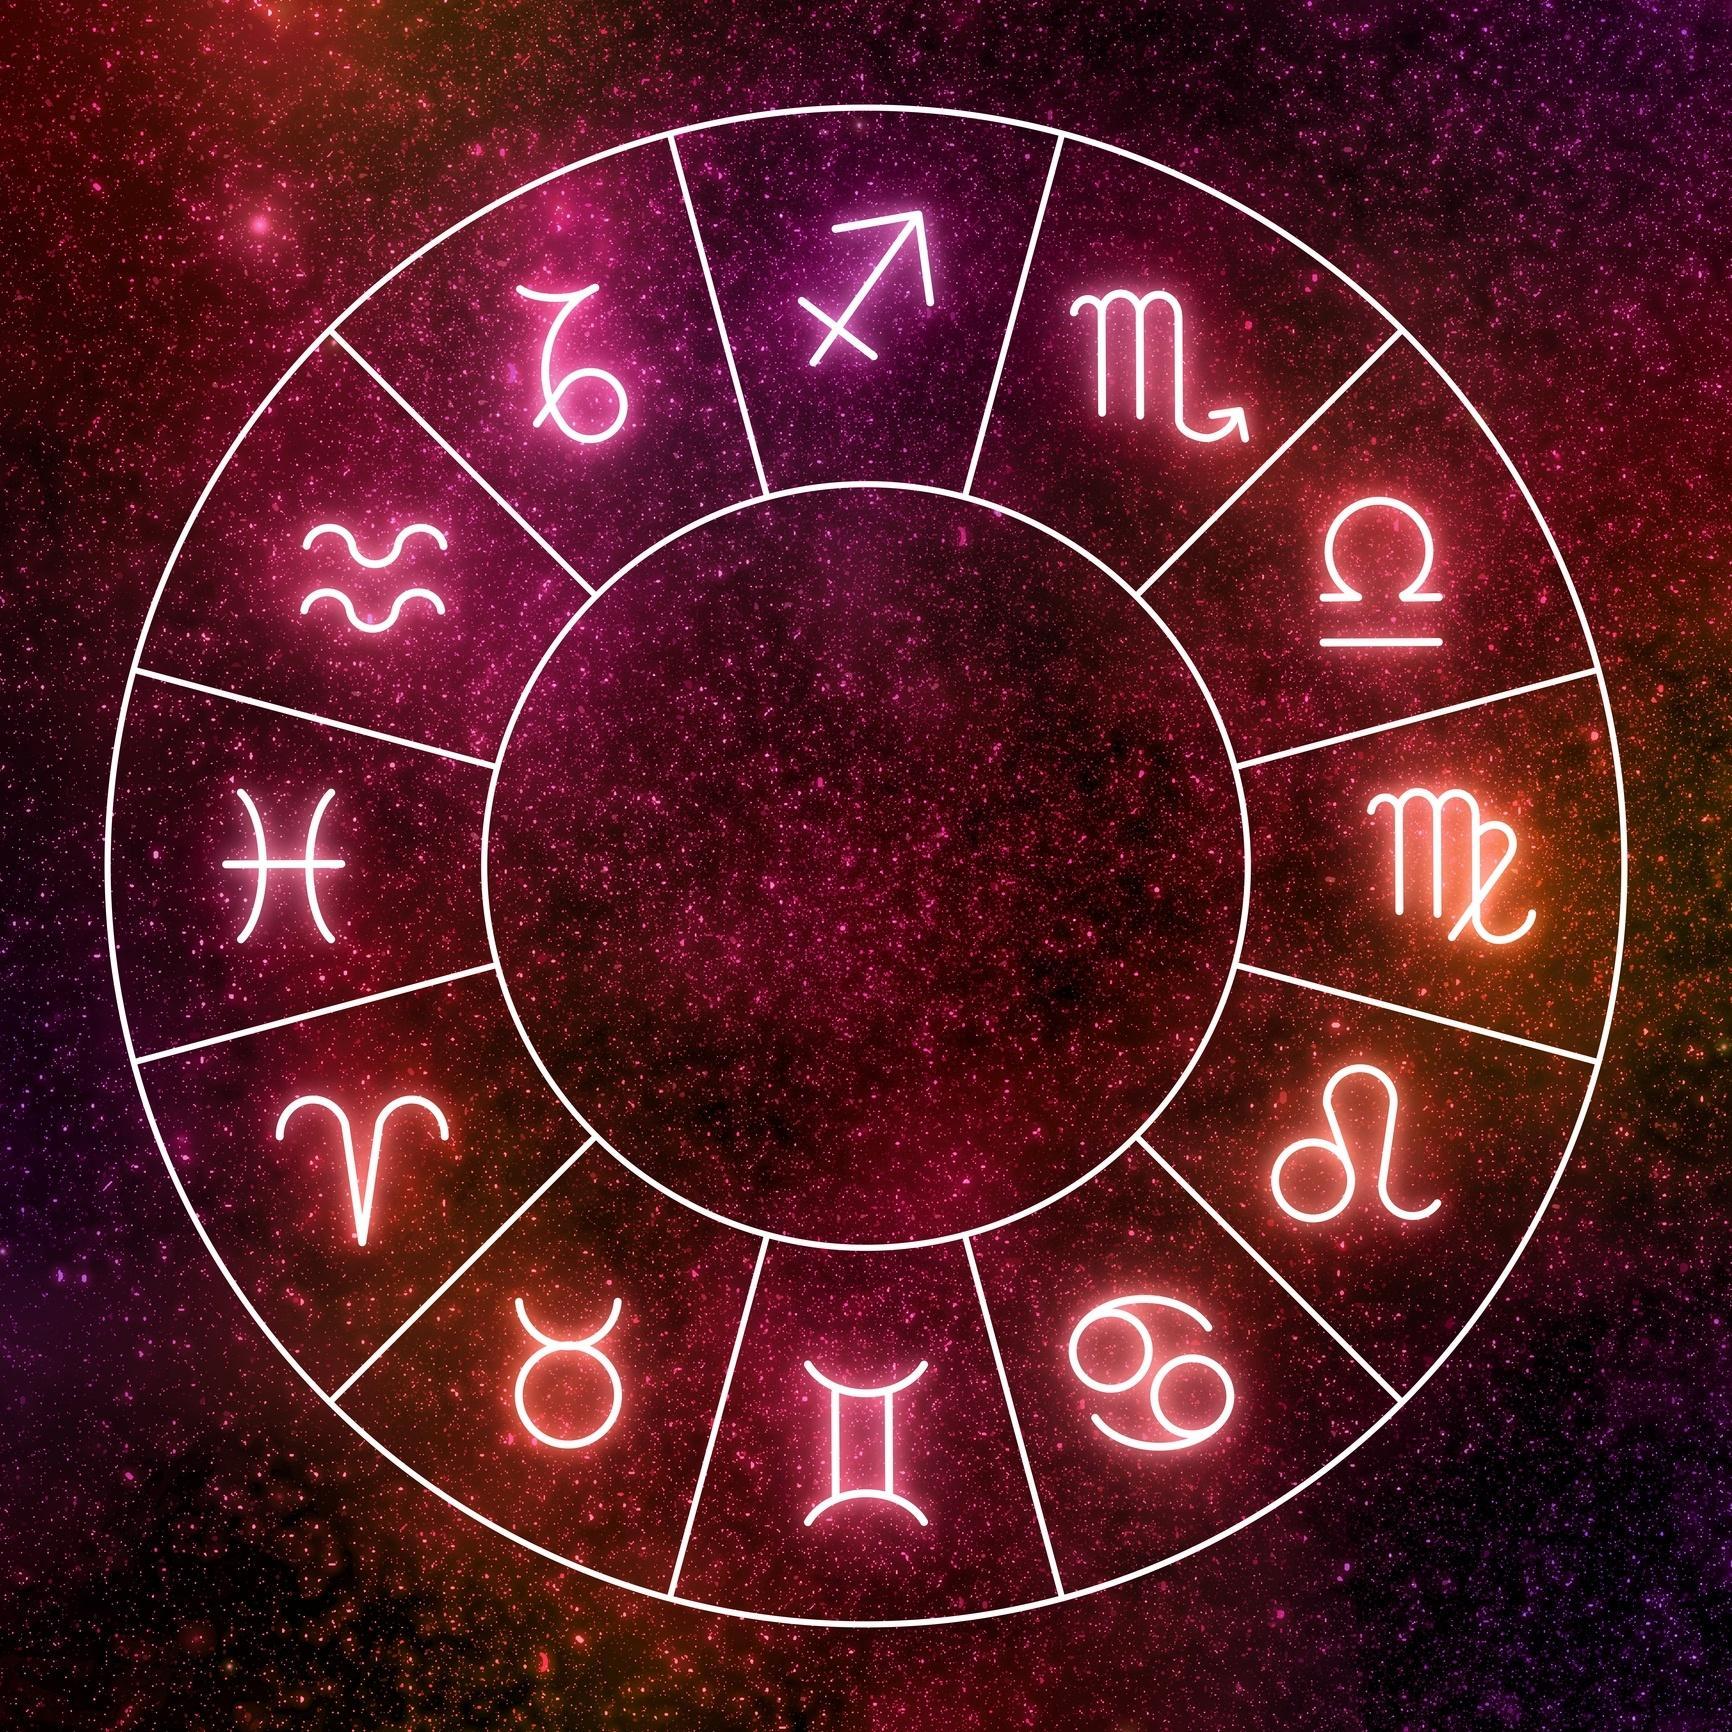 Os Fetiches De Cada Signo 15102017 Uol Universa